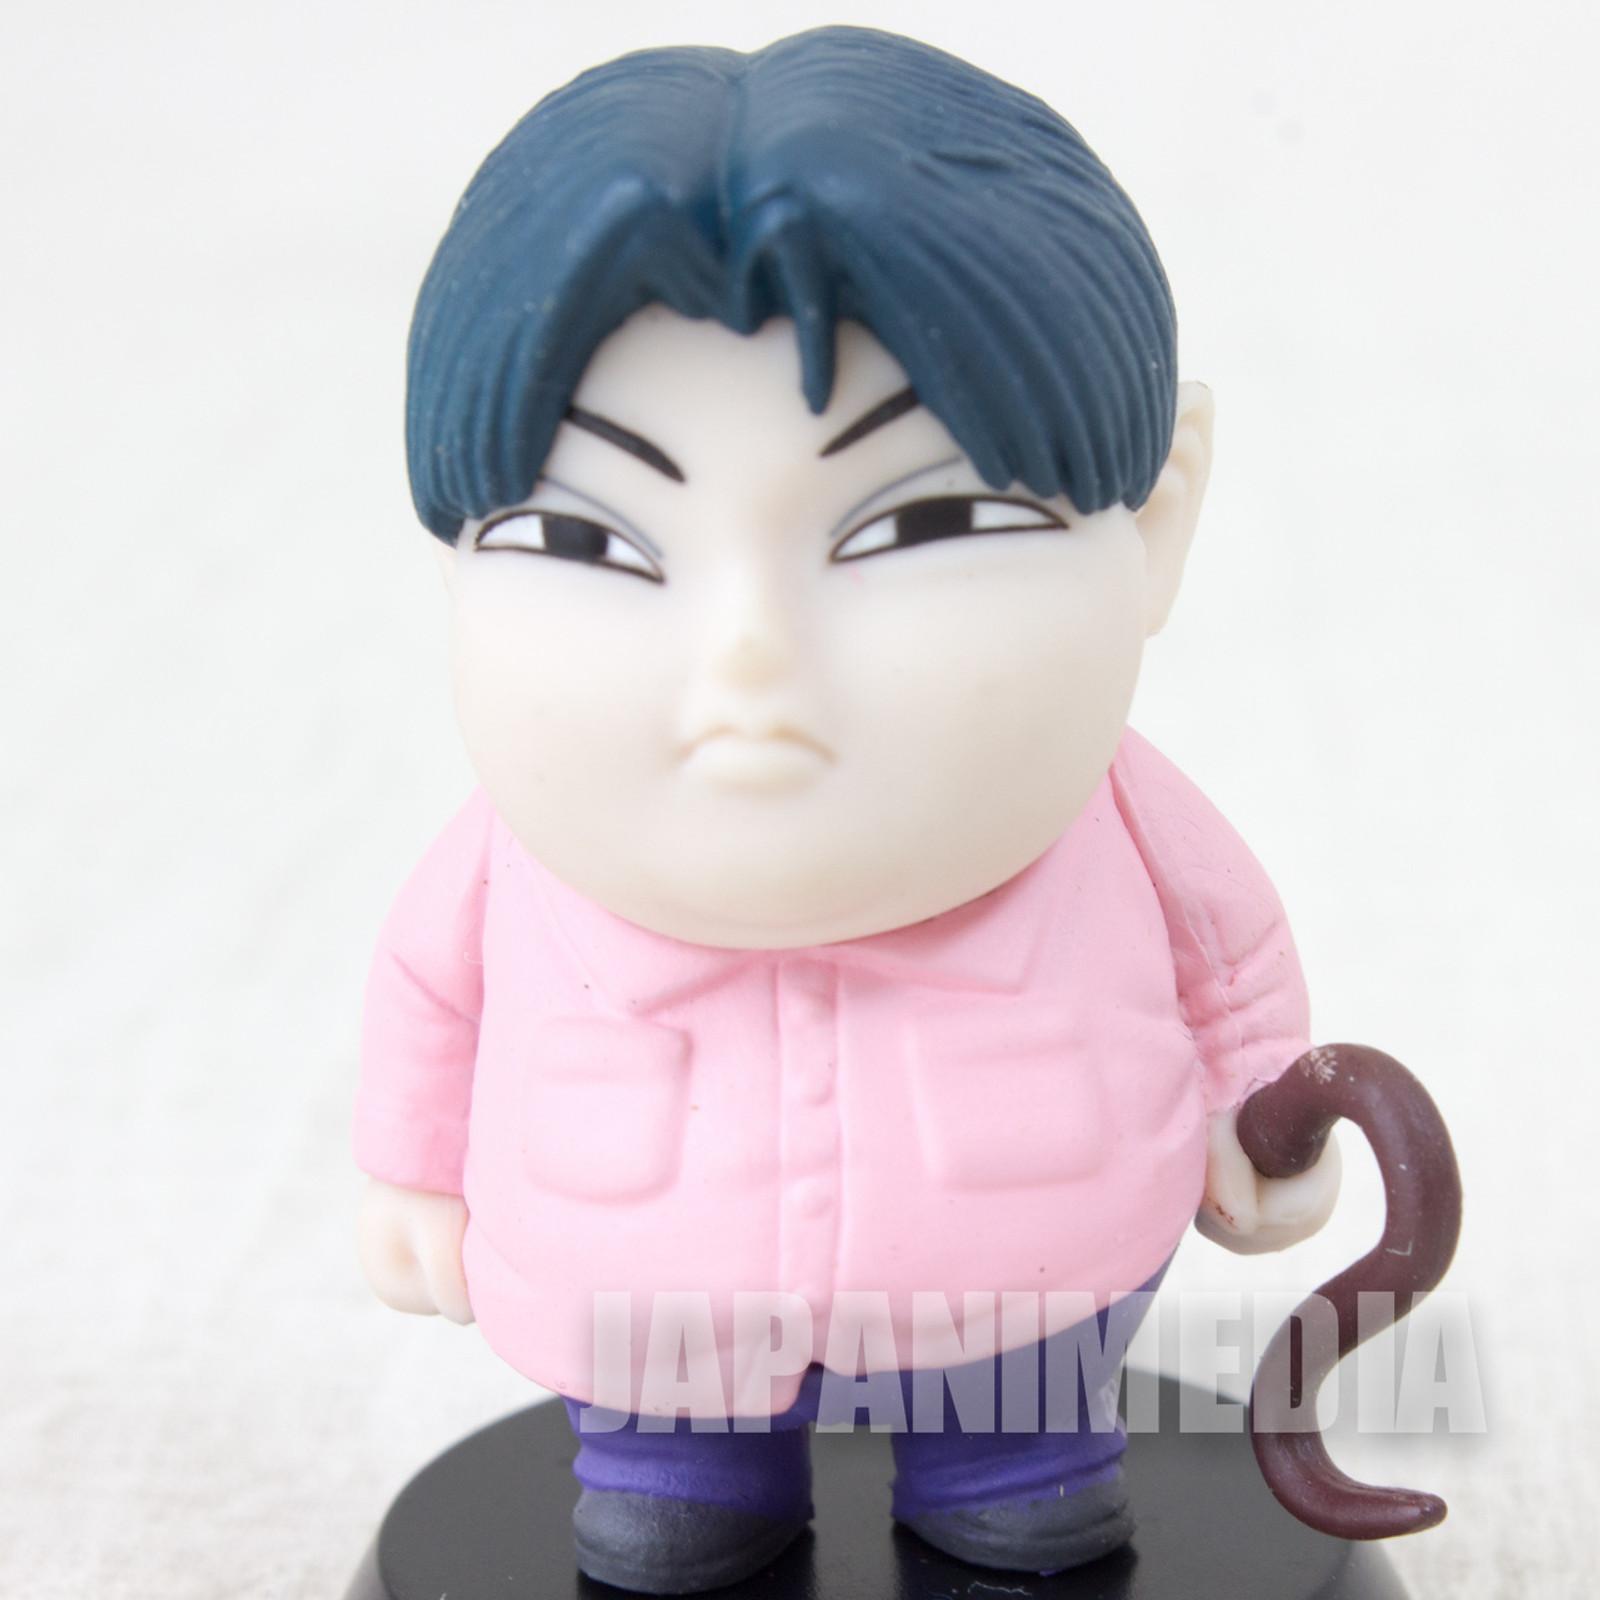 HUNTER x HUNTER Milluki Zoldyck Anime Heroes Mini Big Head Figure JAPAN ANIME MANGA